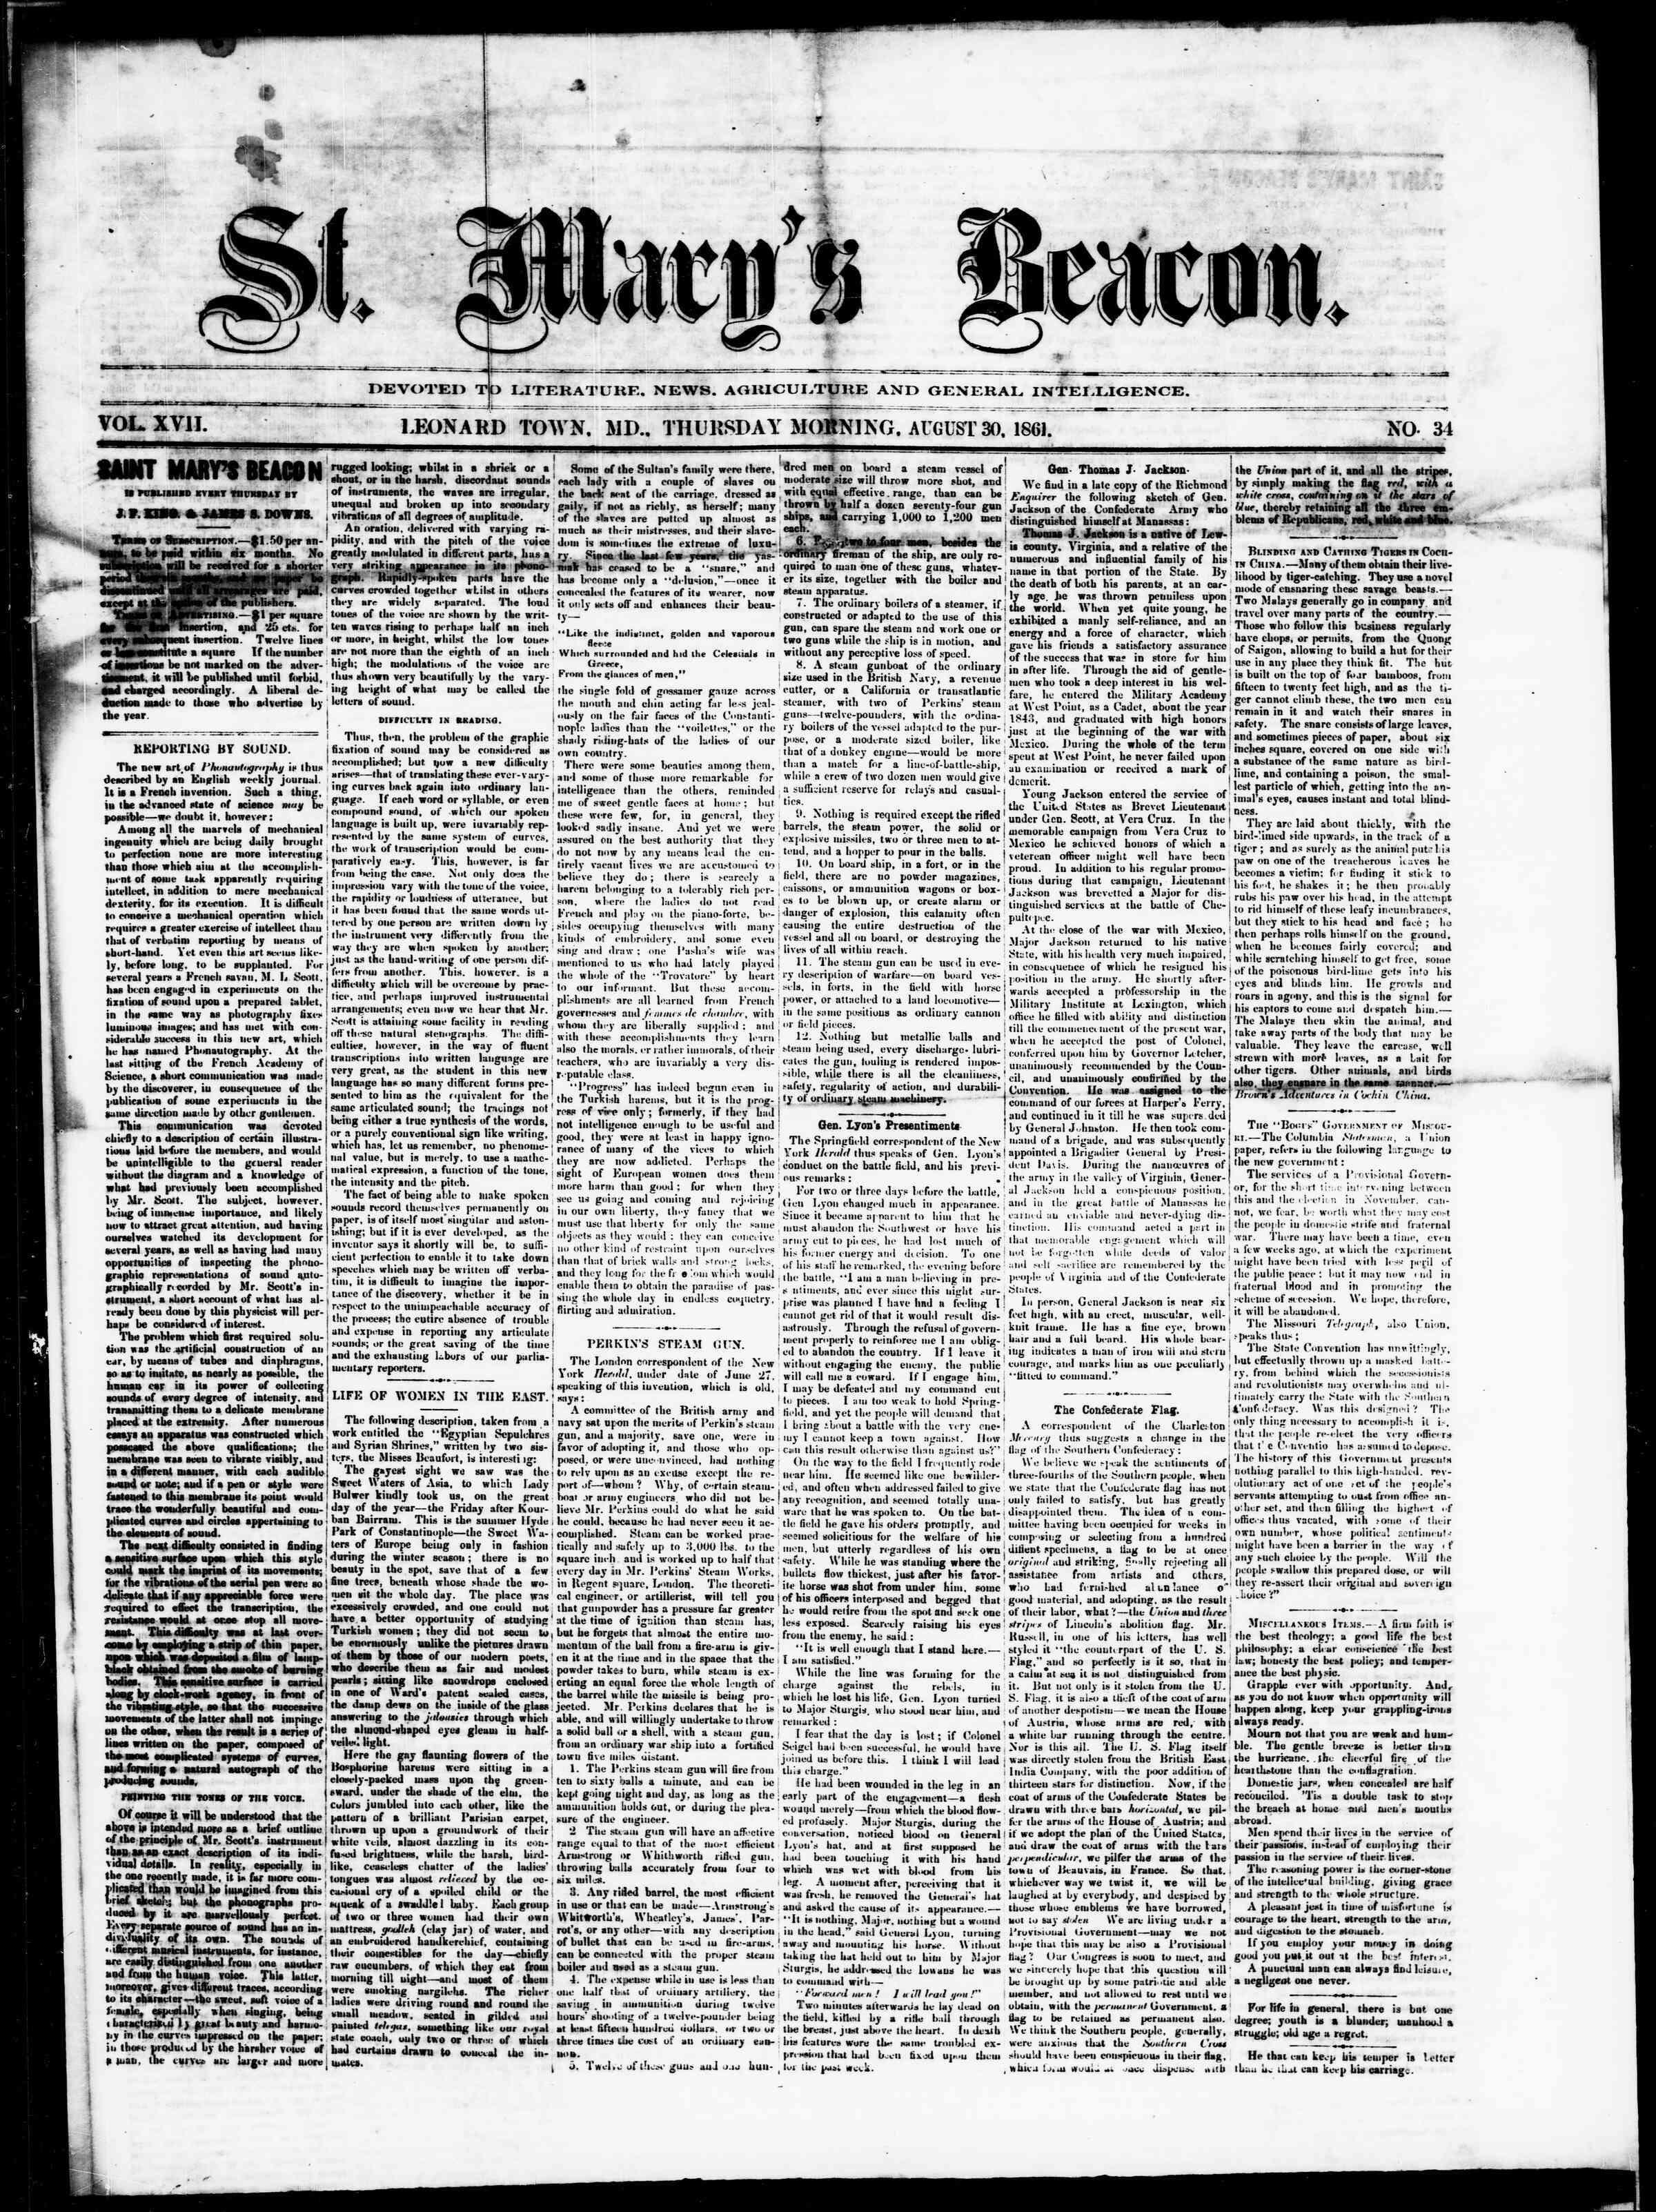 30 Ağustos 1861 tarihli St. Mary's Beacon Gazetesi Sayfa 2